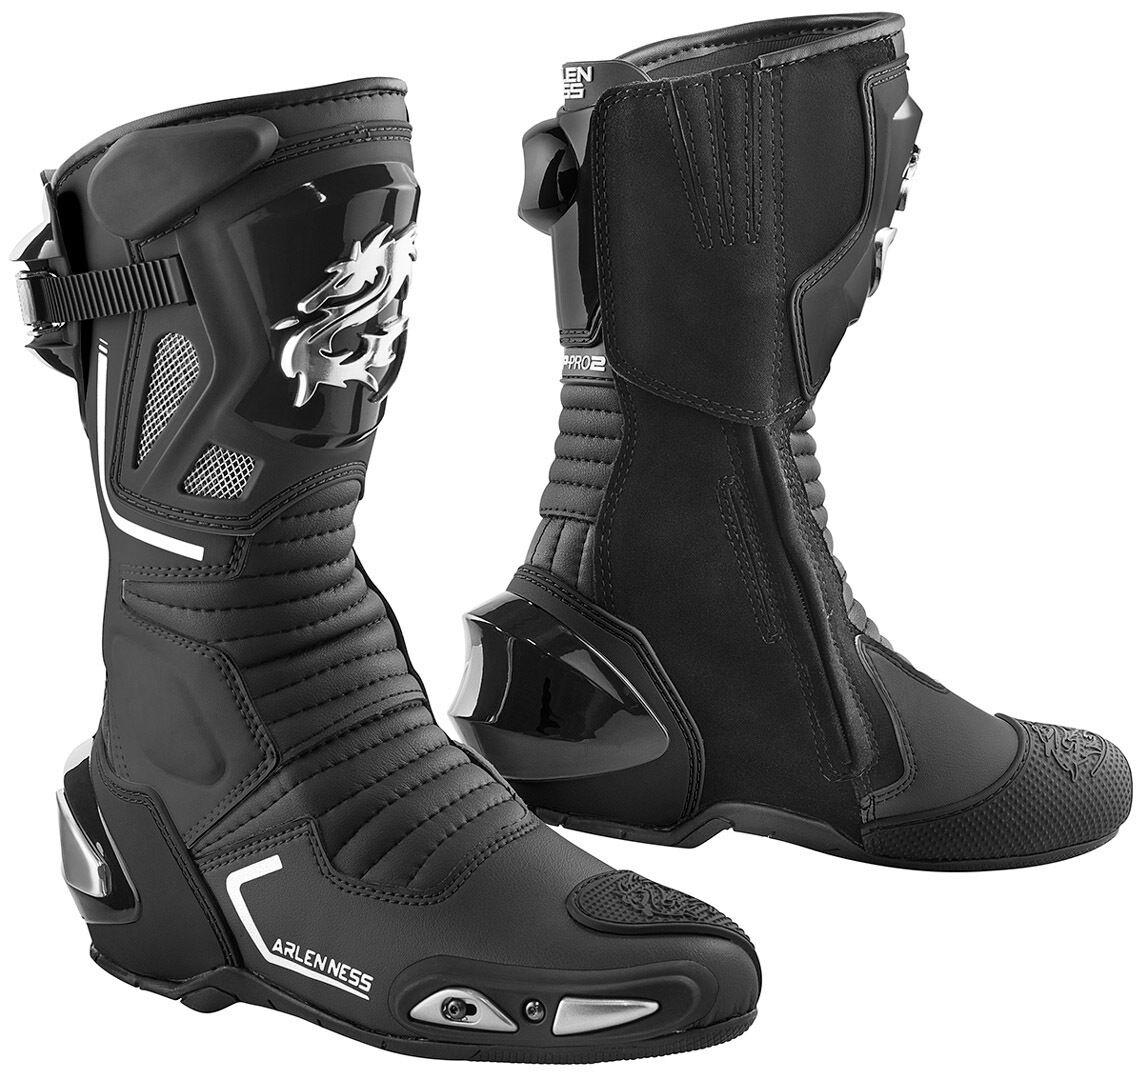 Arlen Ness Sugello Bottes de moto Noir taille : 47